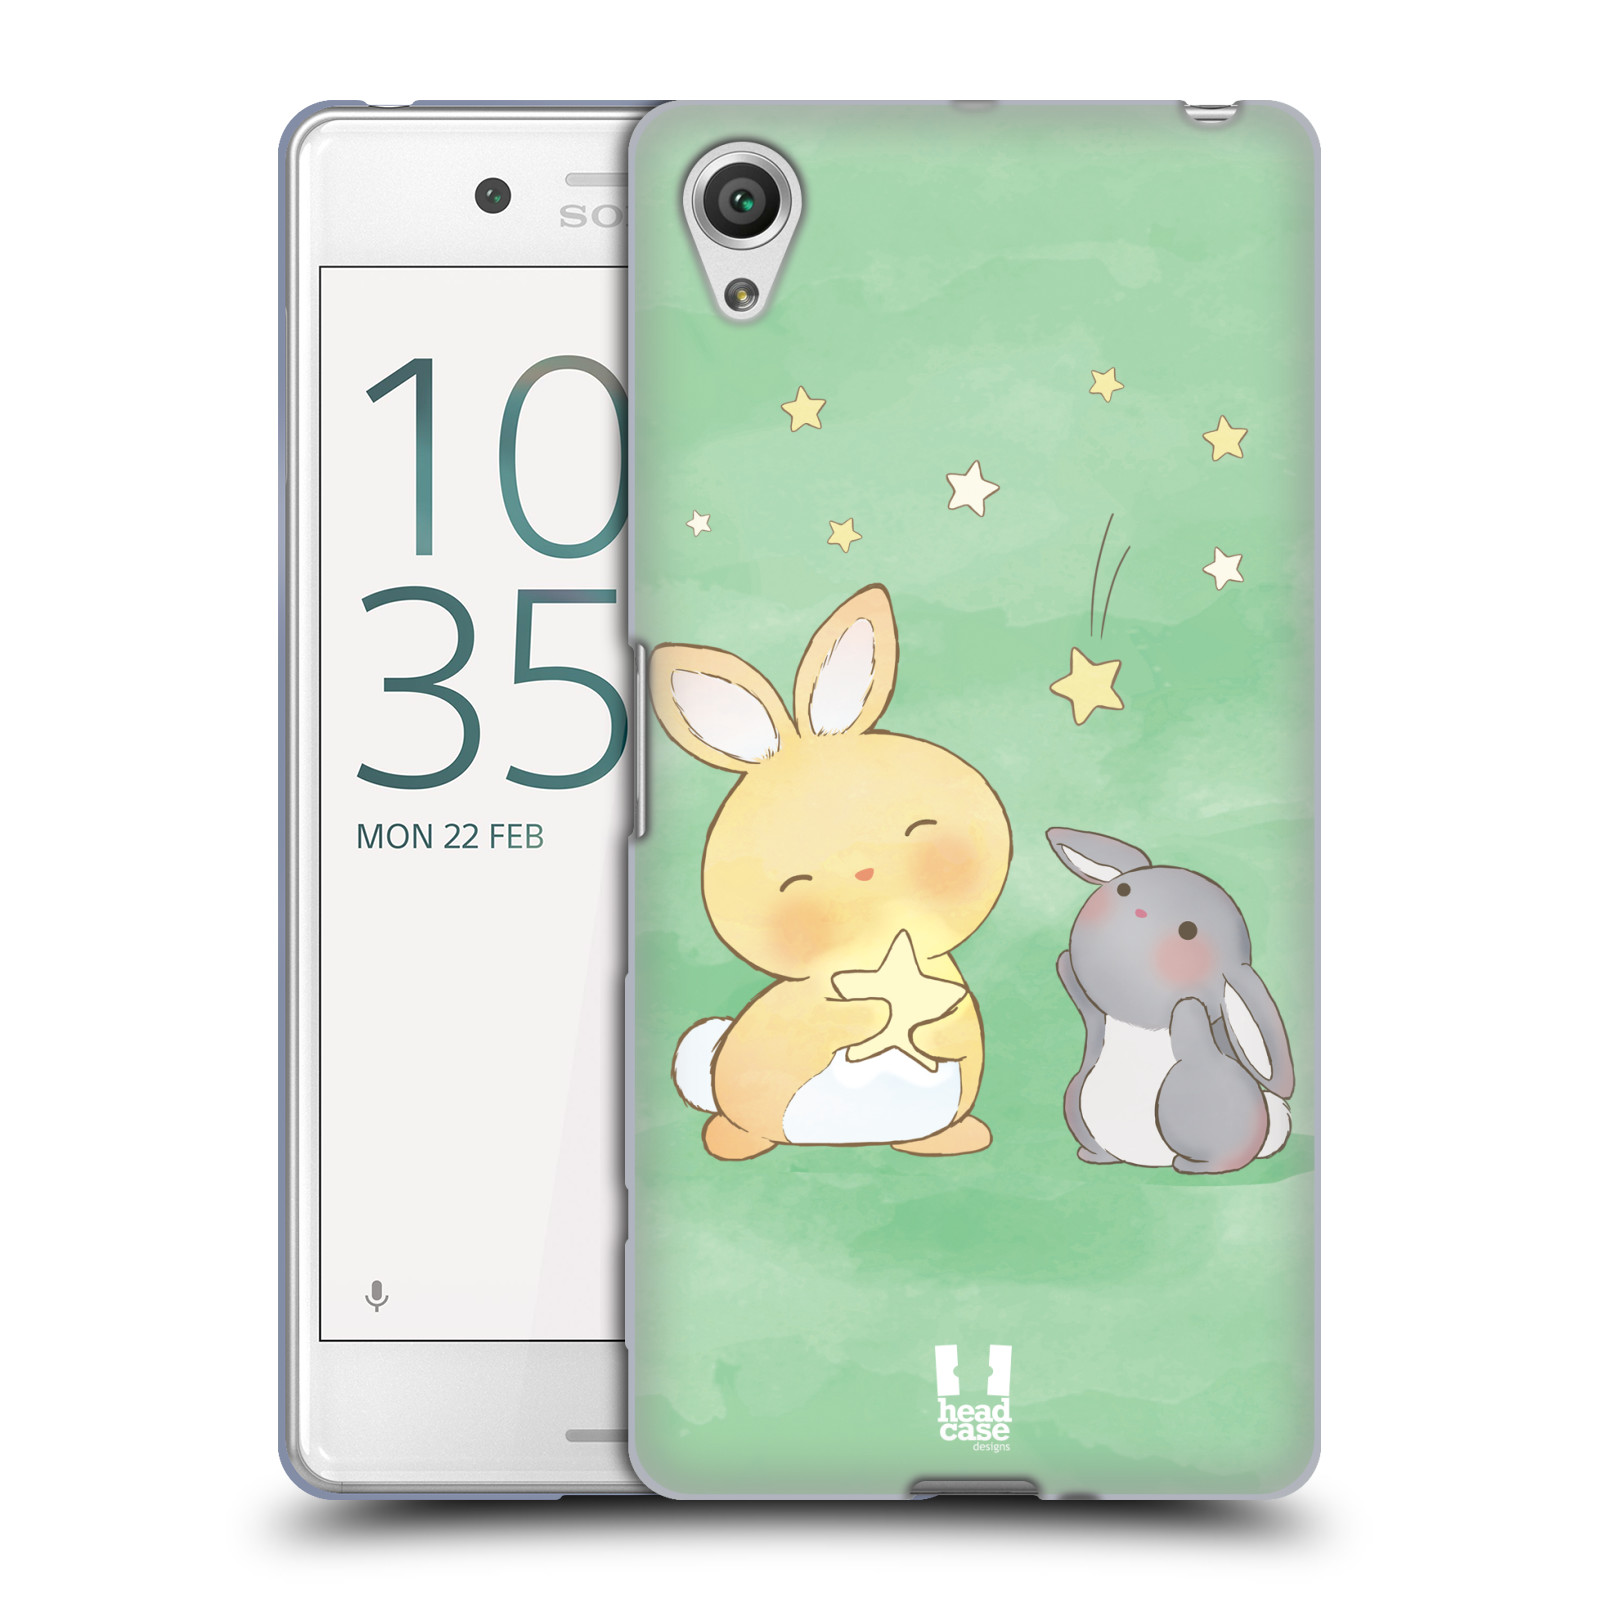 HEAD CASE silikonový obal na mobil Sony Xperia X PERFORMANCE (F8131, F8132) vzor králíček a hvězdy zelená